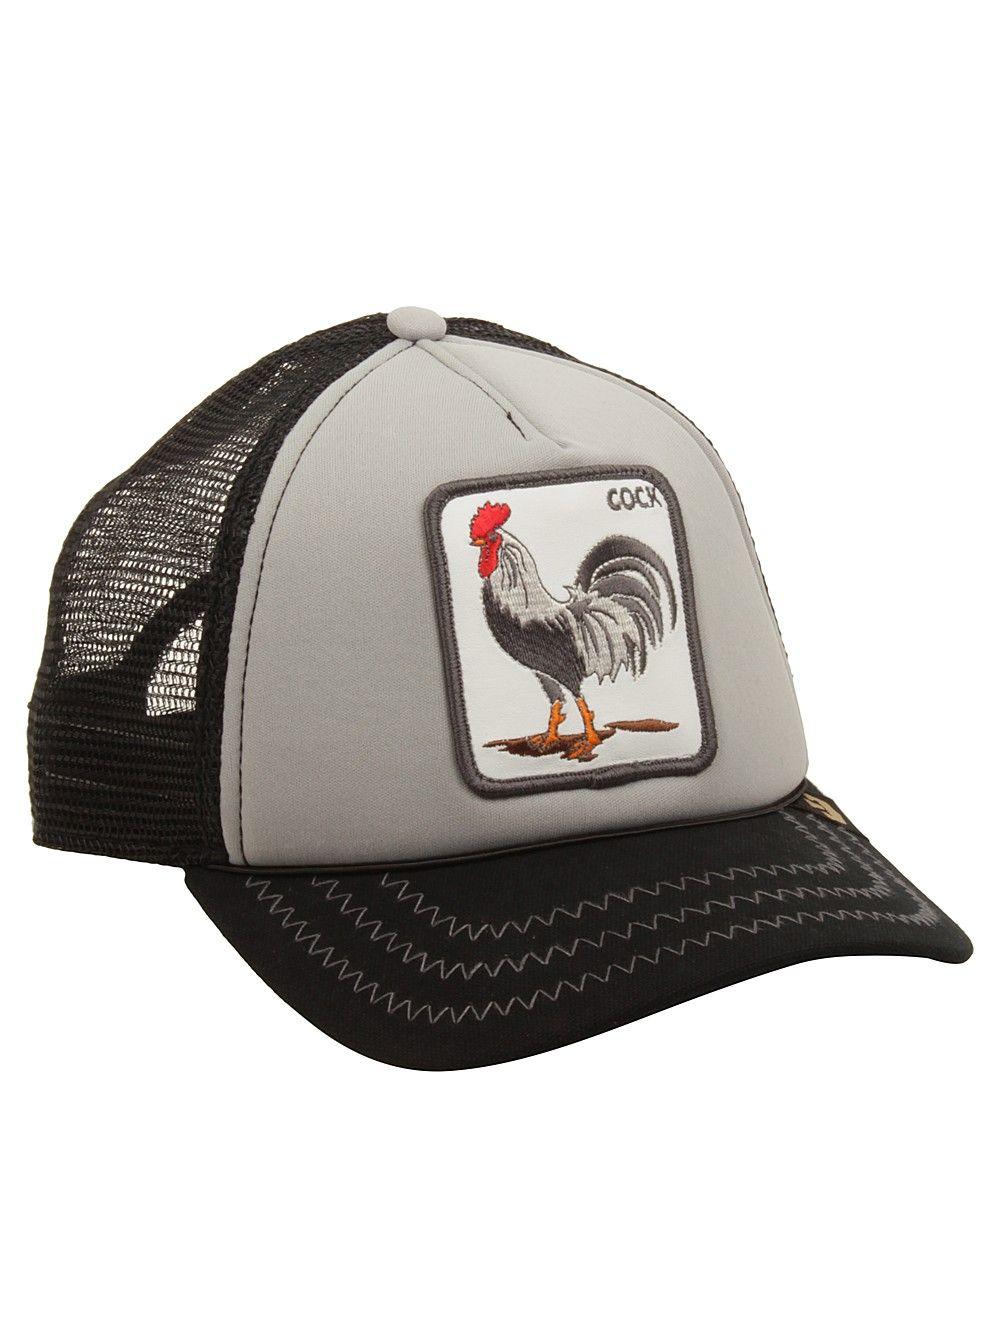 A trucker style baseball cap that s featured in Goorin s Animal Farm  Collection!  designerstudiostore  holidaygift  giftforhim d9c9e774001